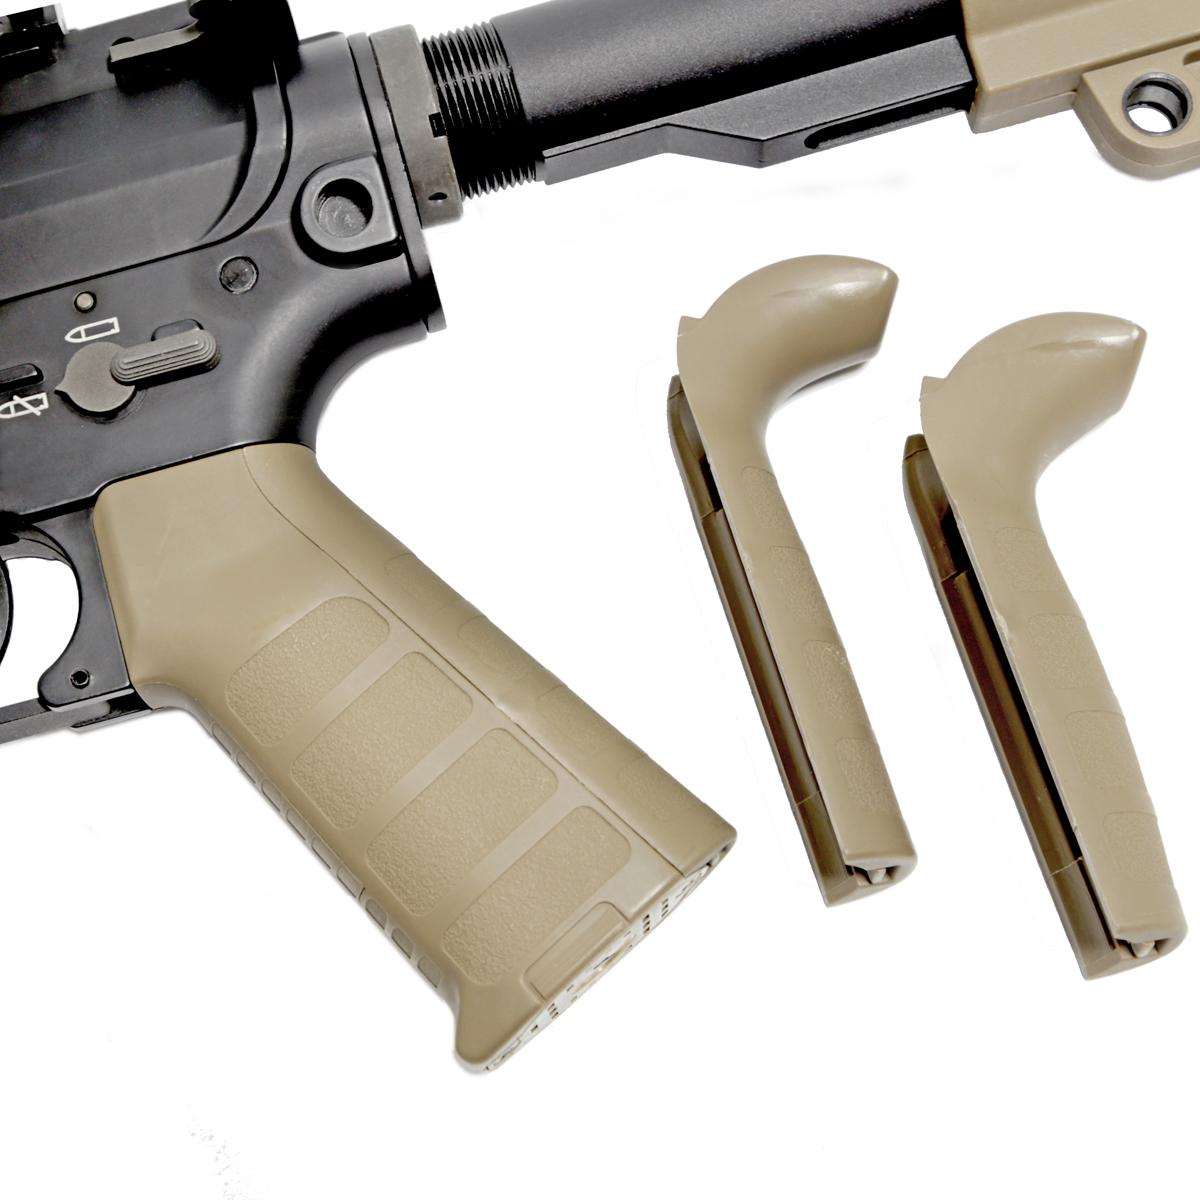 M4 TWS KeyMod Carbine - Çöl Rengi